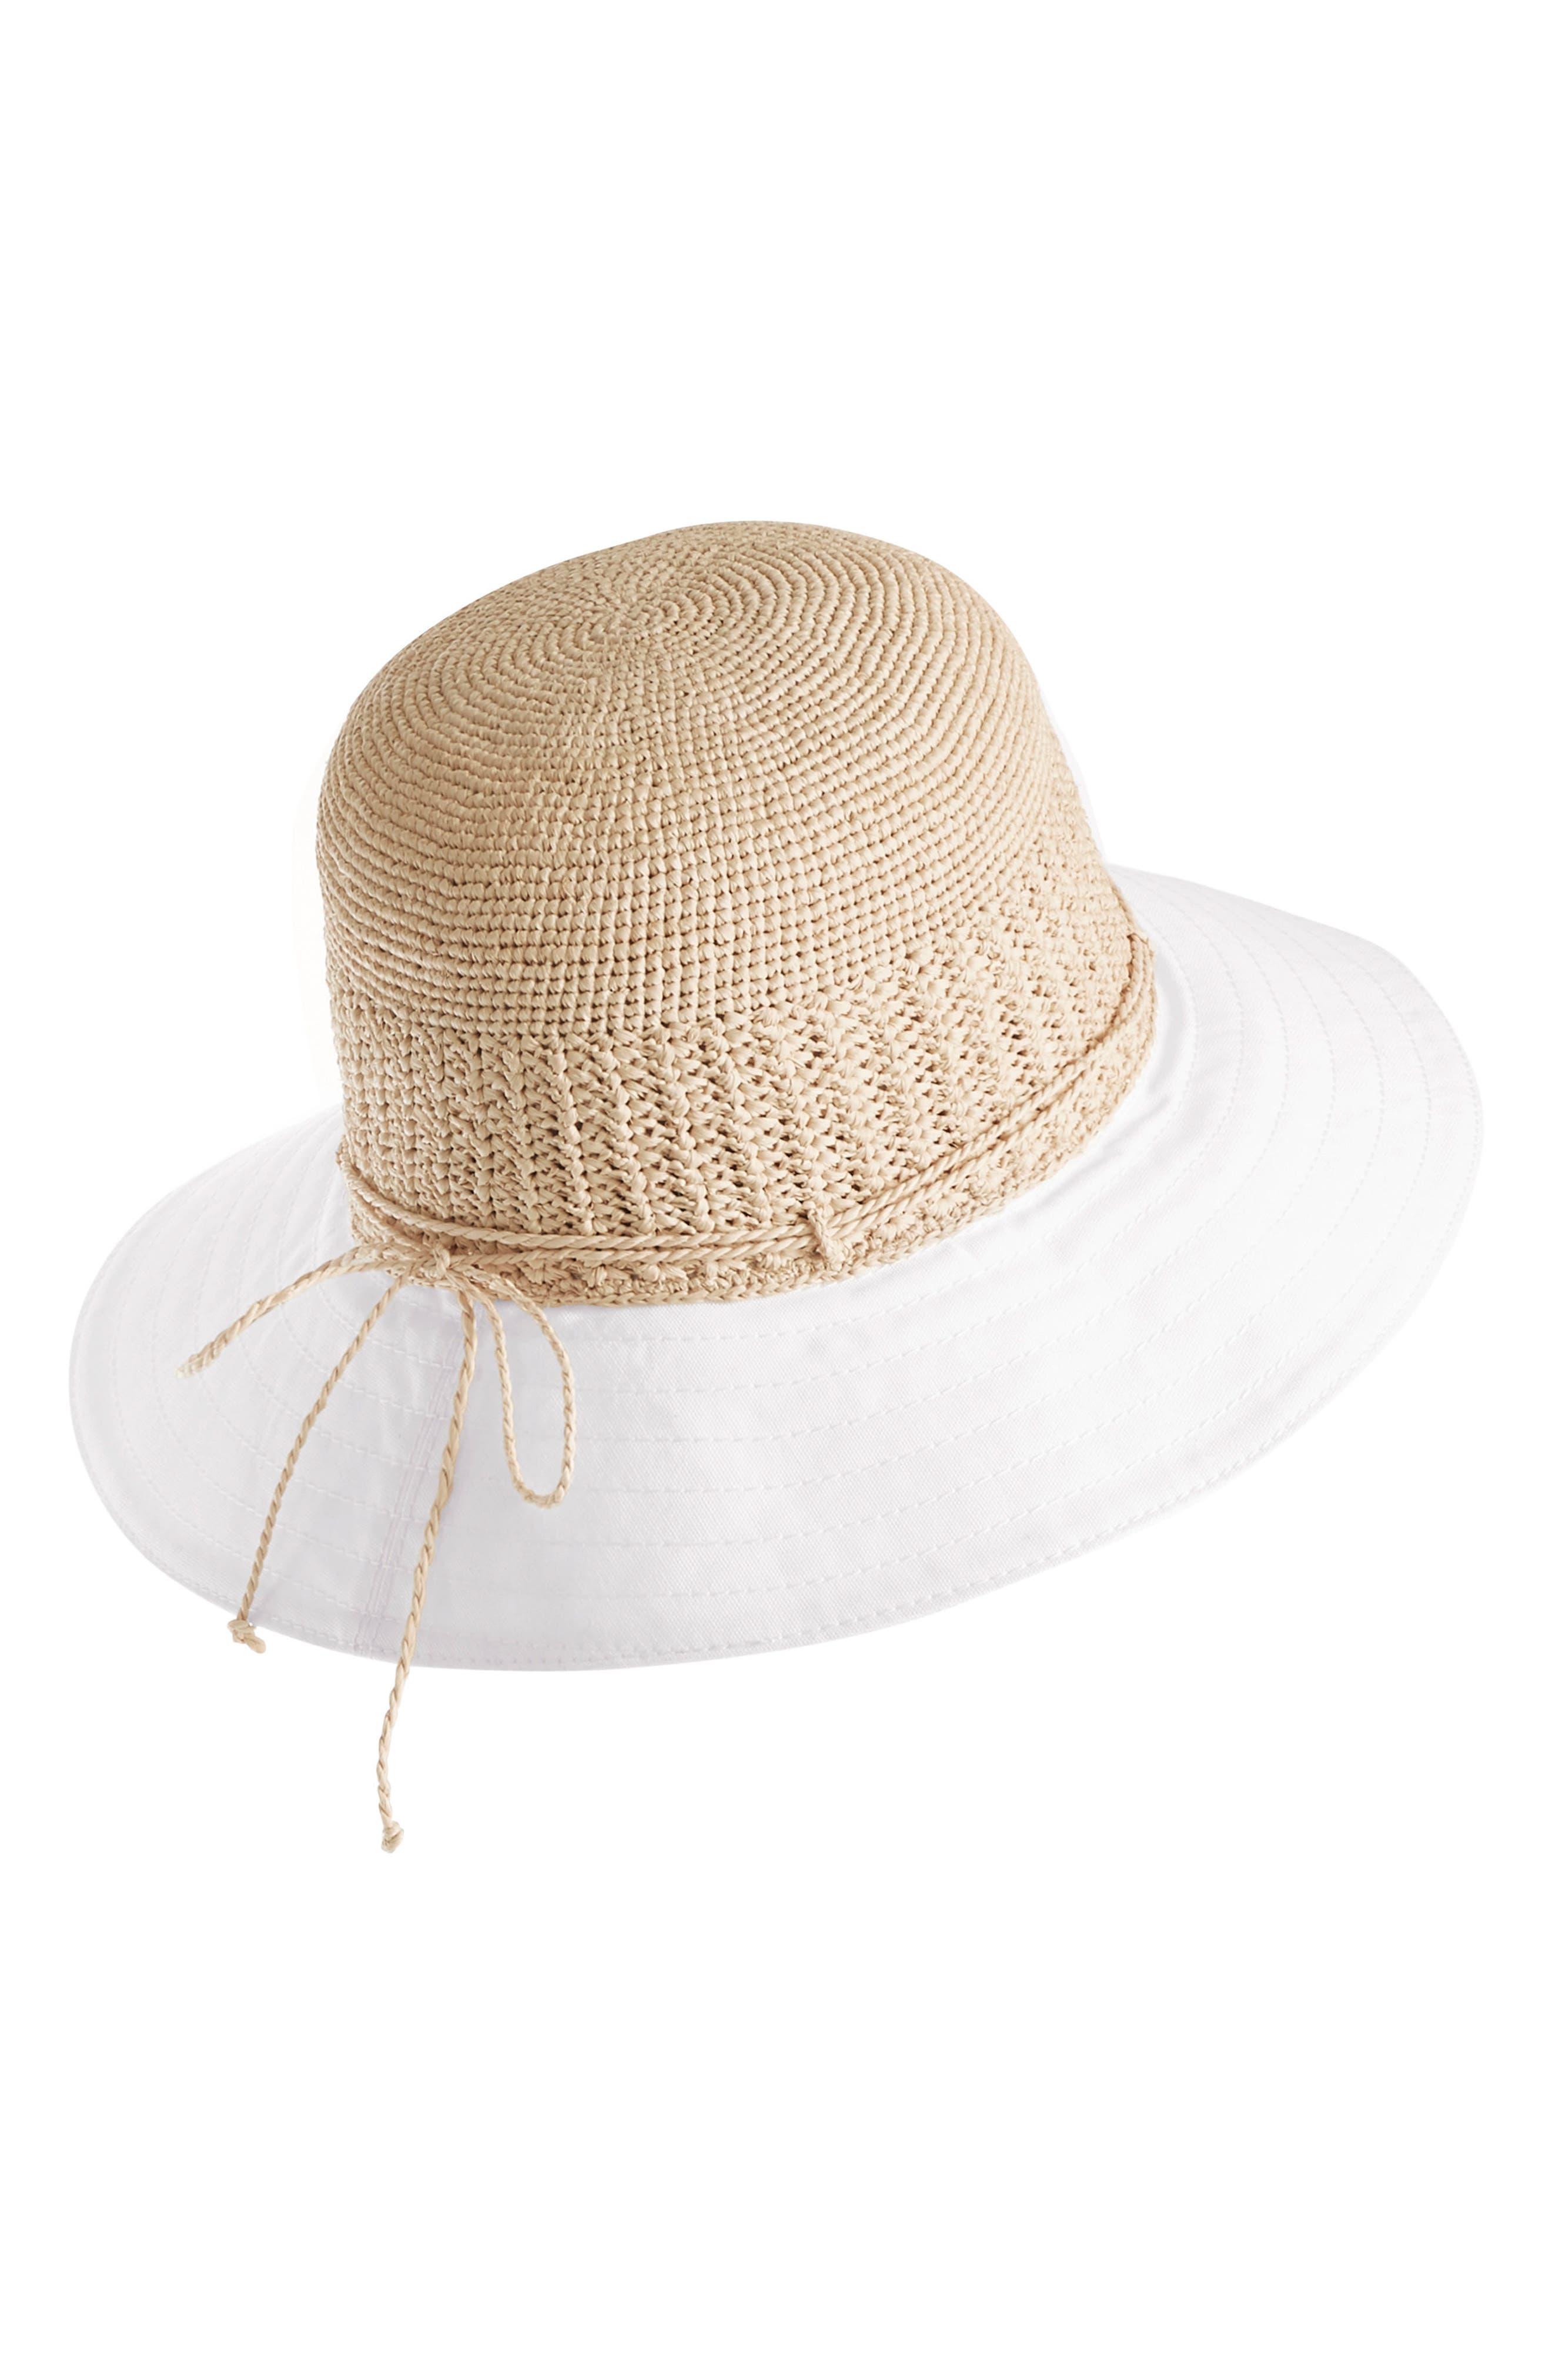 Cotton Brim Raffia Hat,                             Alternate thumbnail 2, color,                             Natural/ White